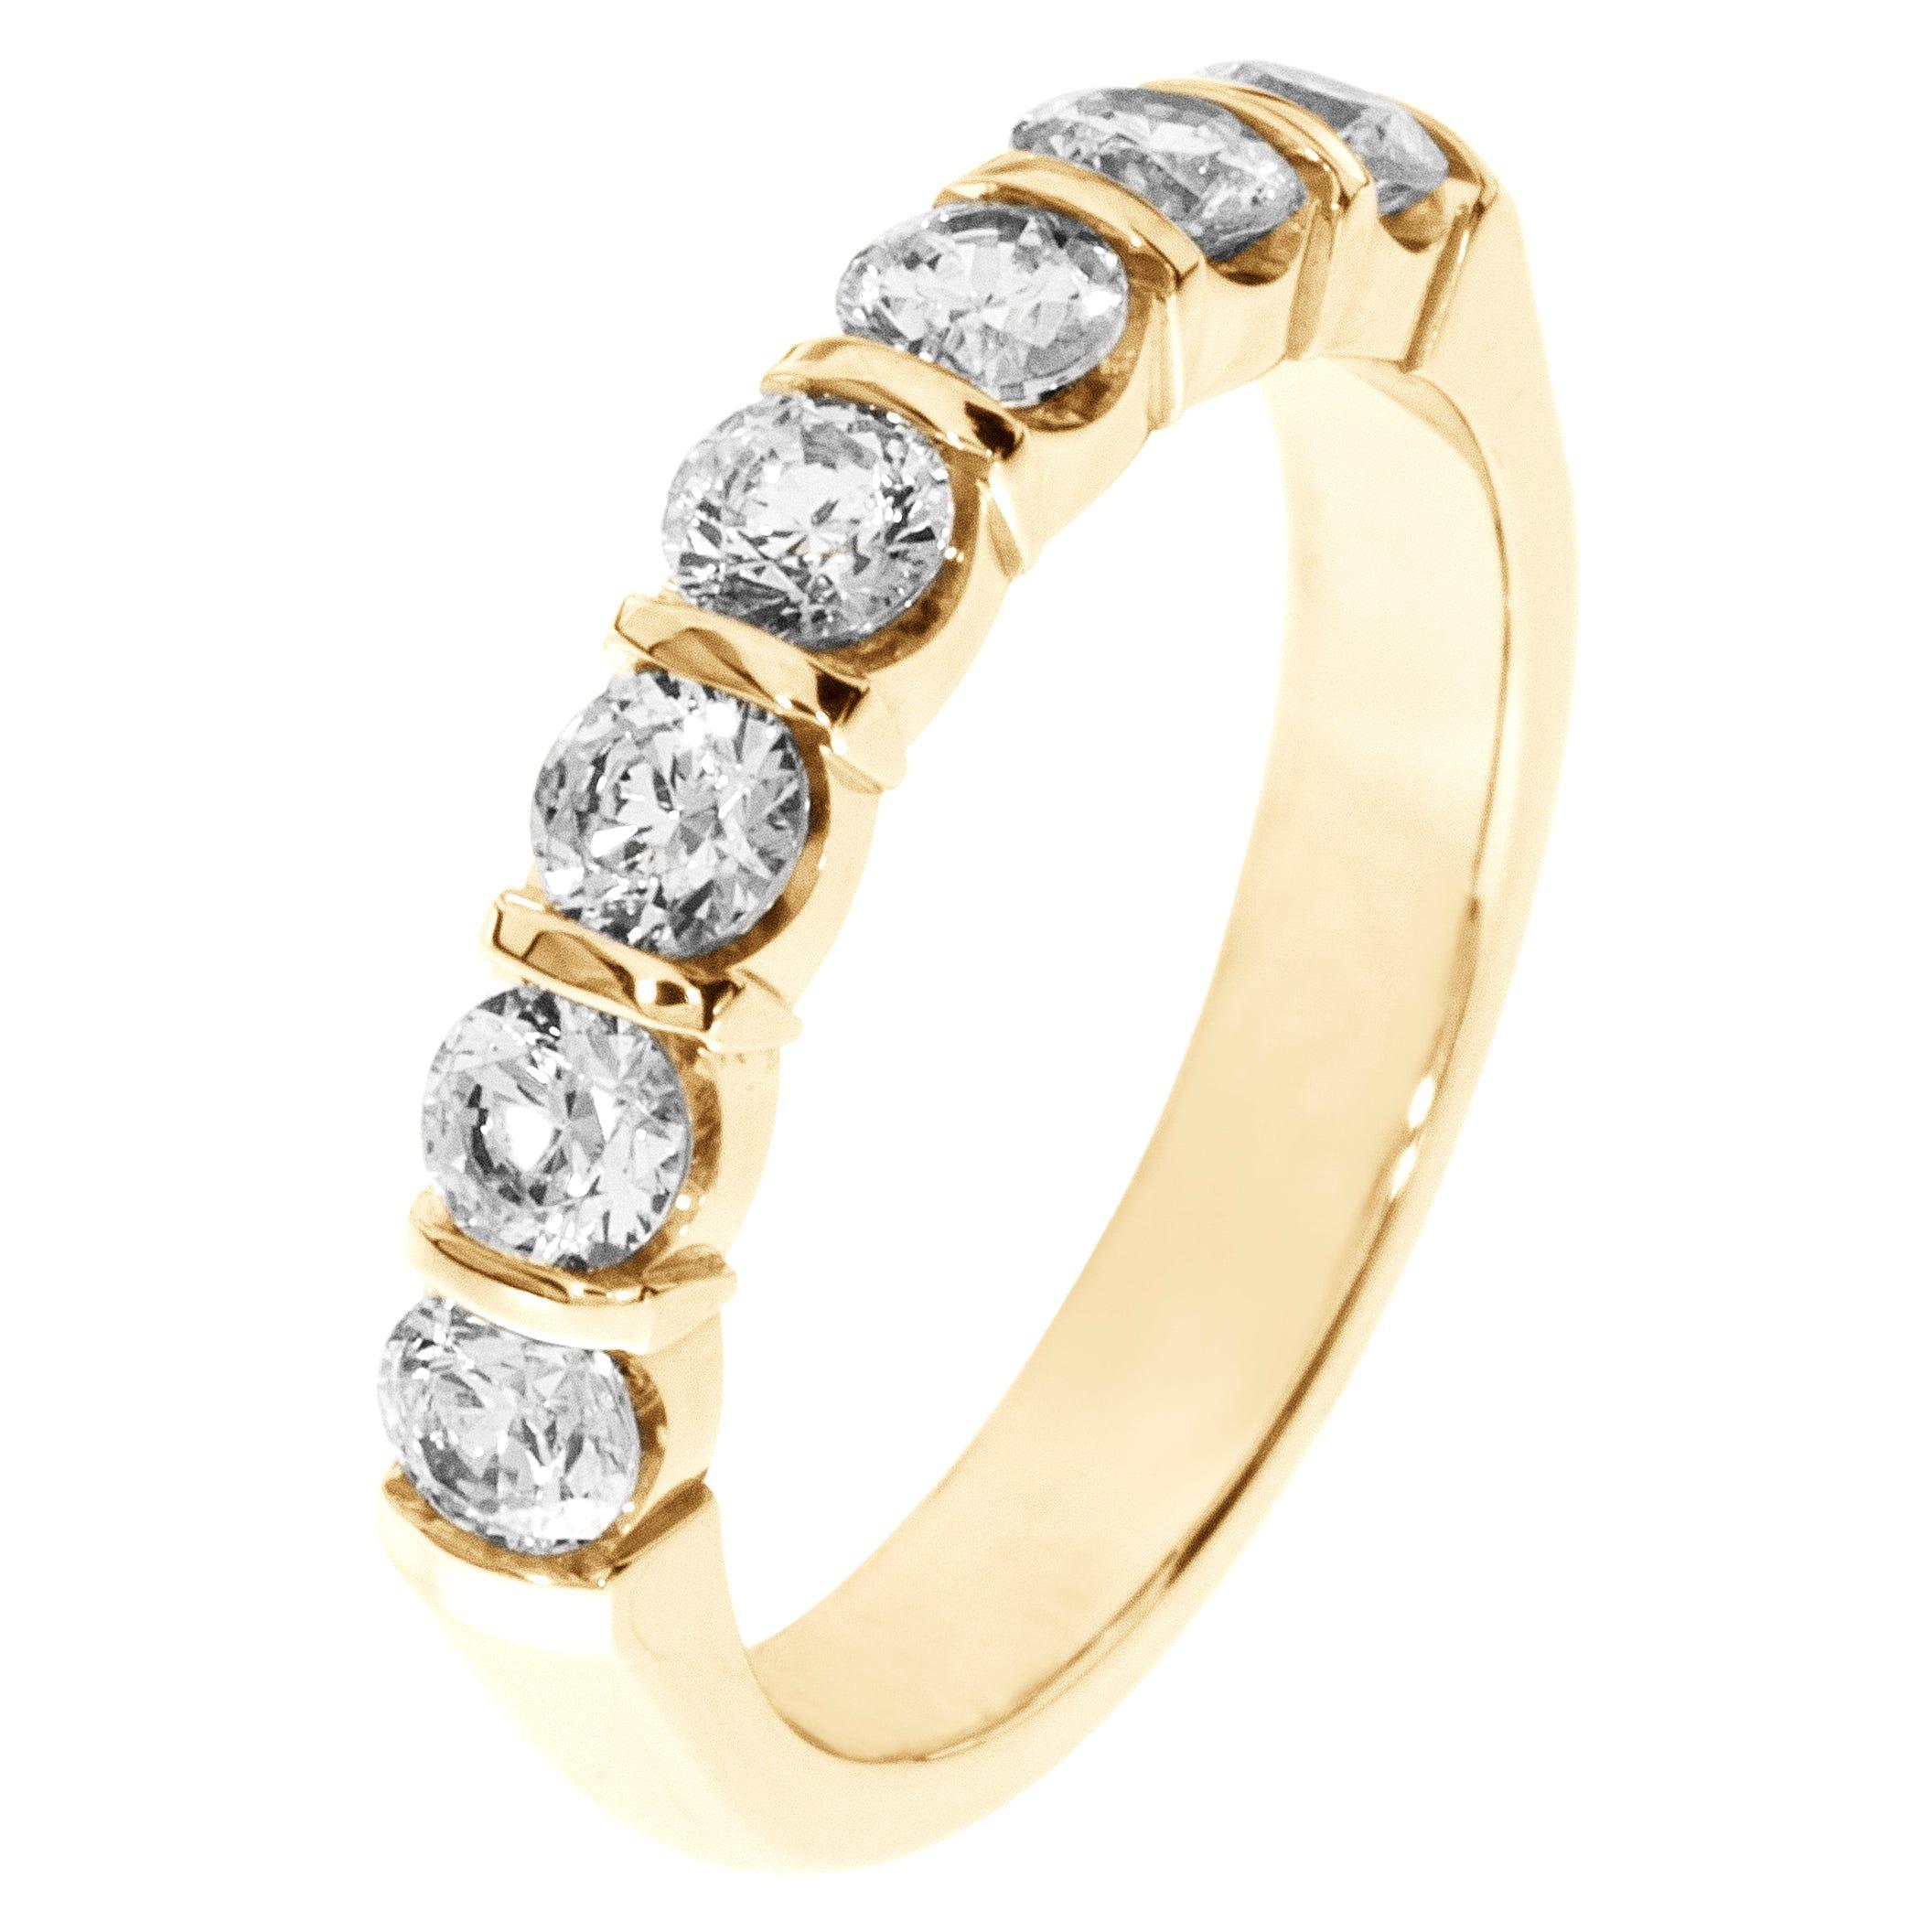 7-Stone Diamond Band 1ctw. (H-I, I1) 18K Yellow Gold